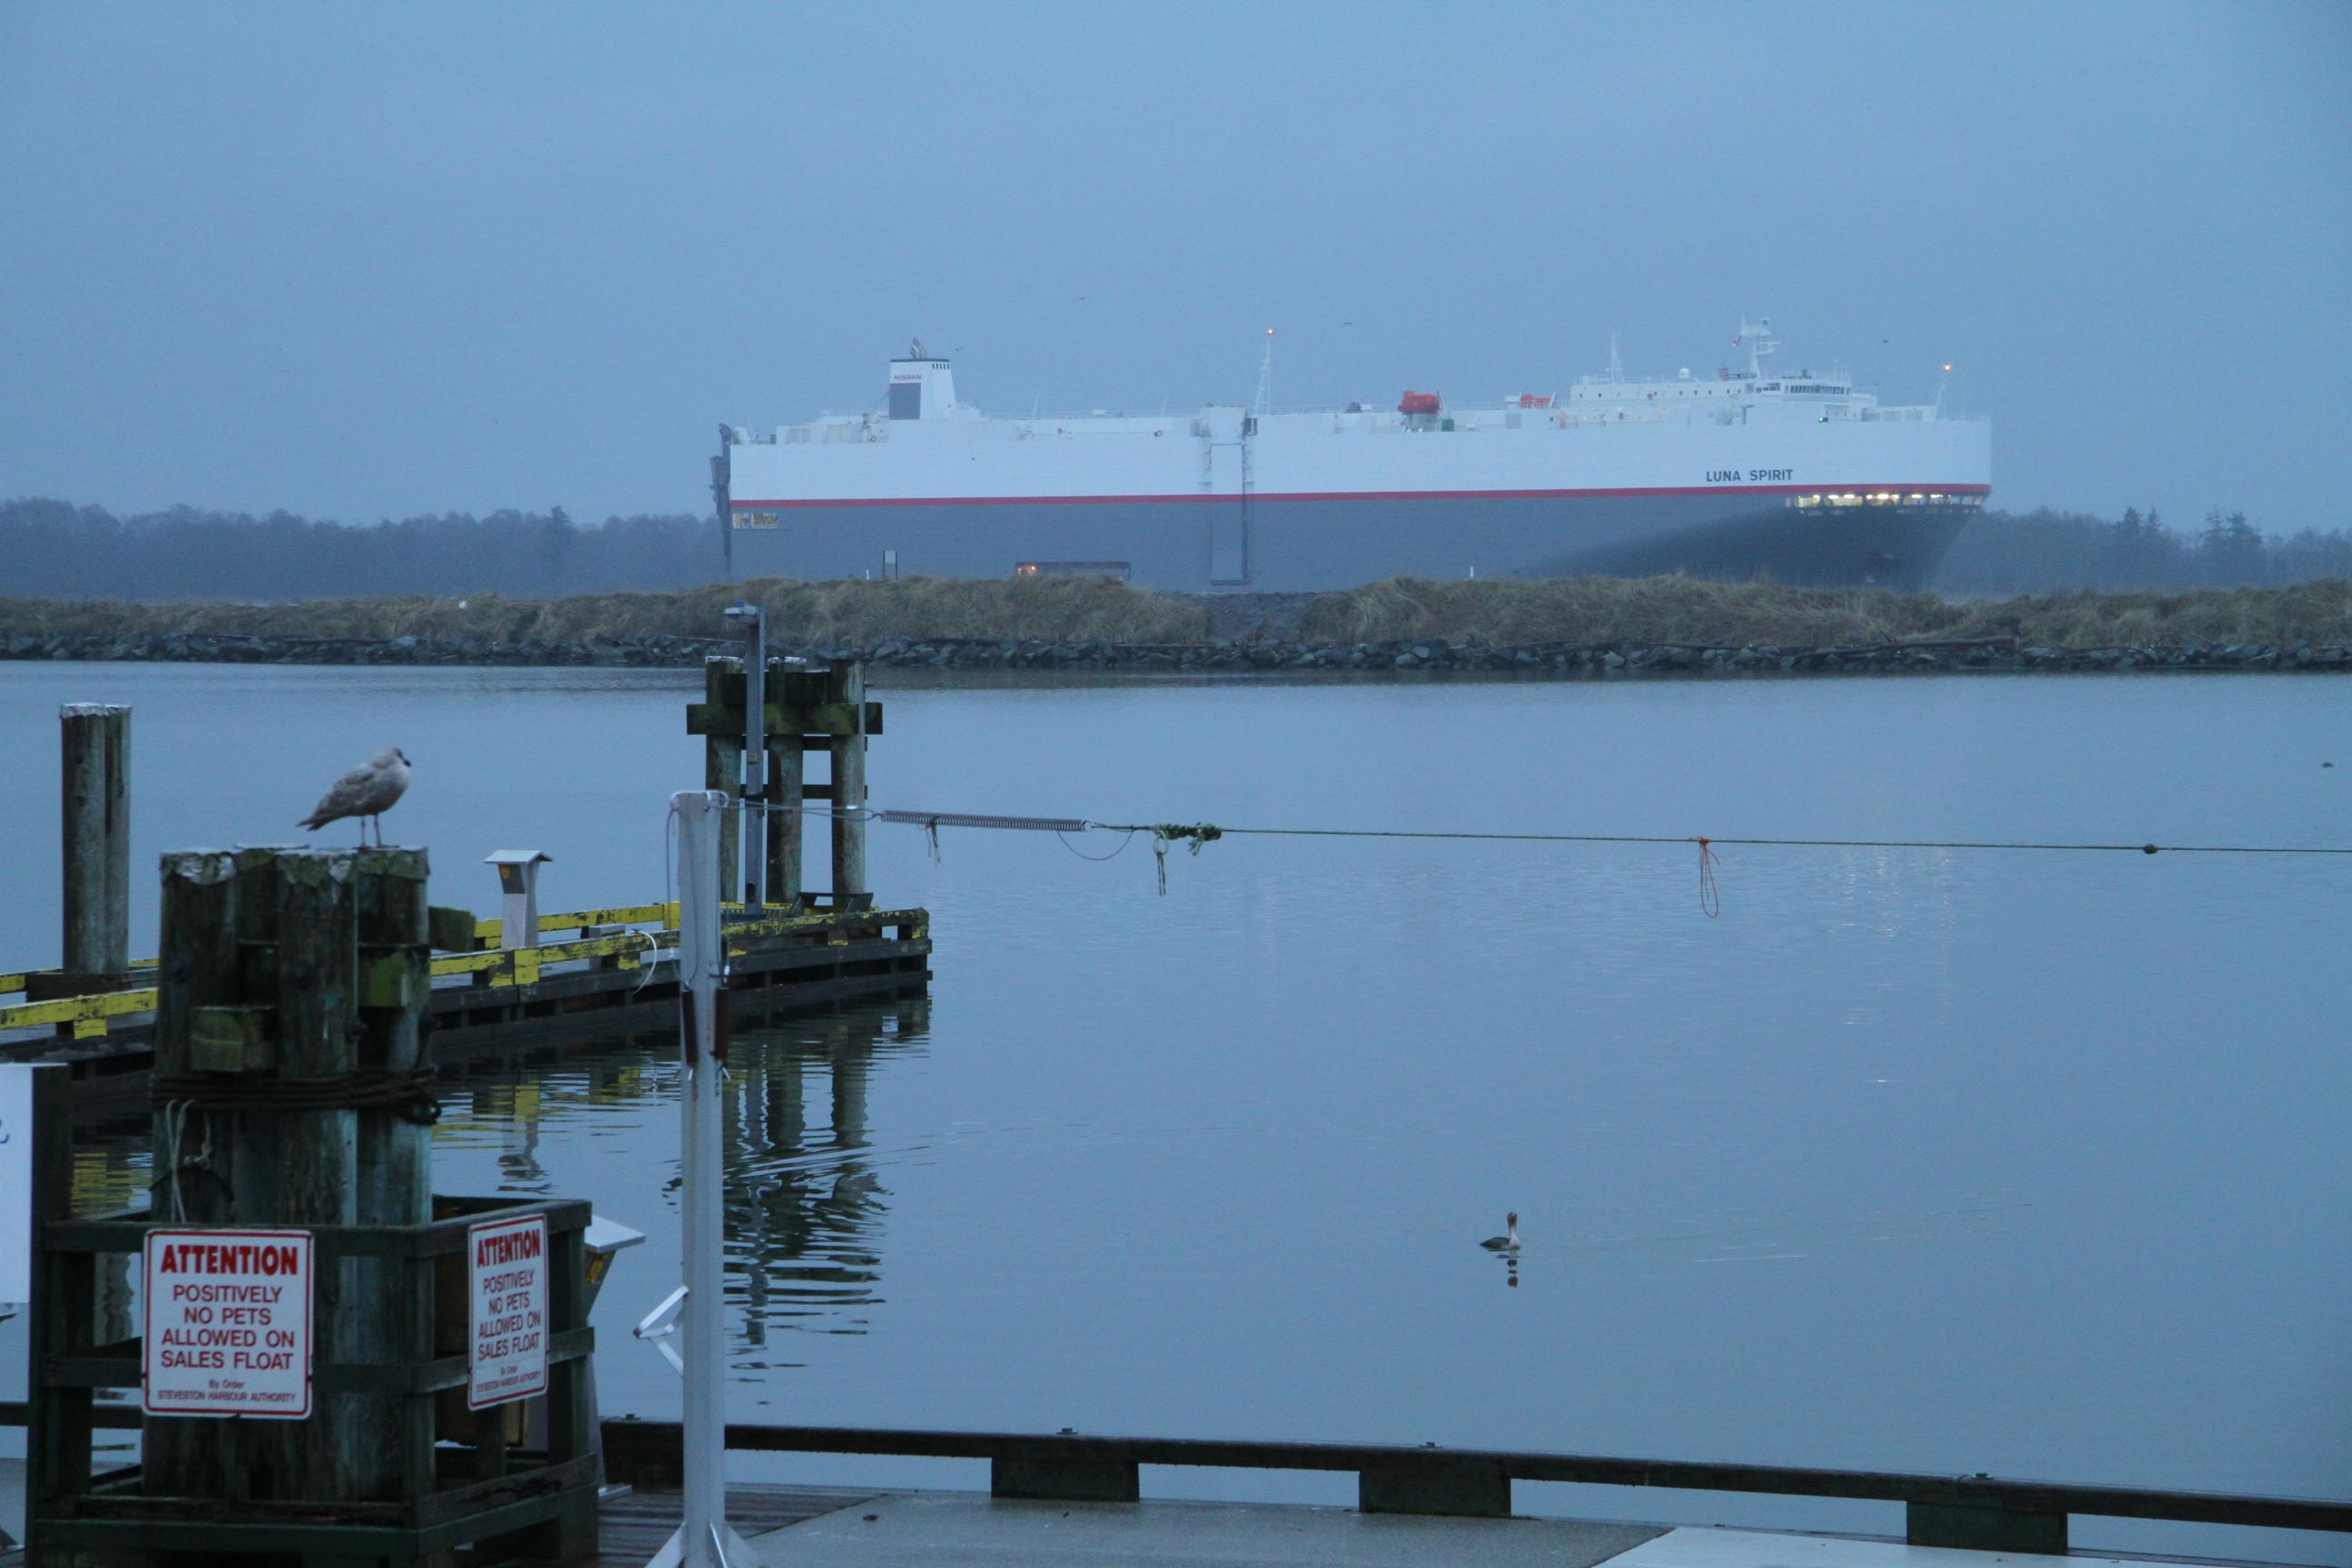 Freighter on the Fraser